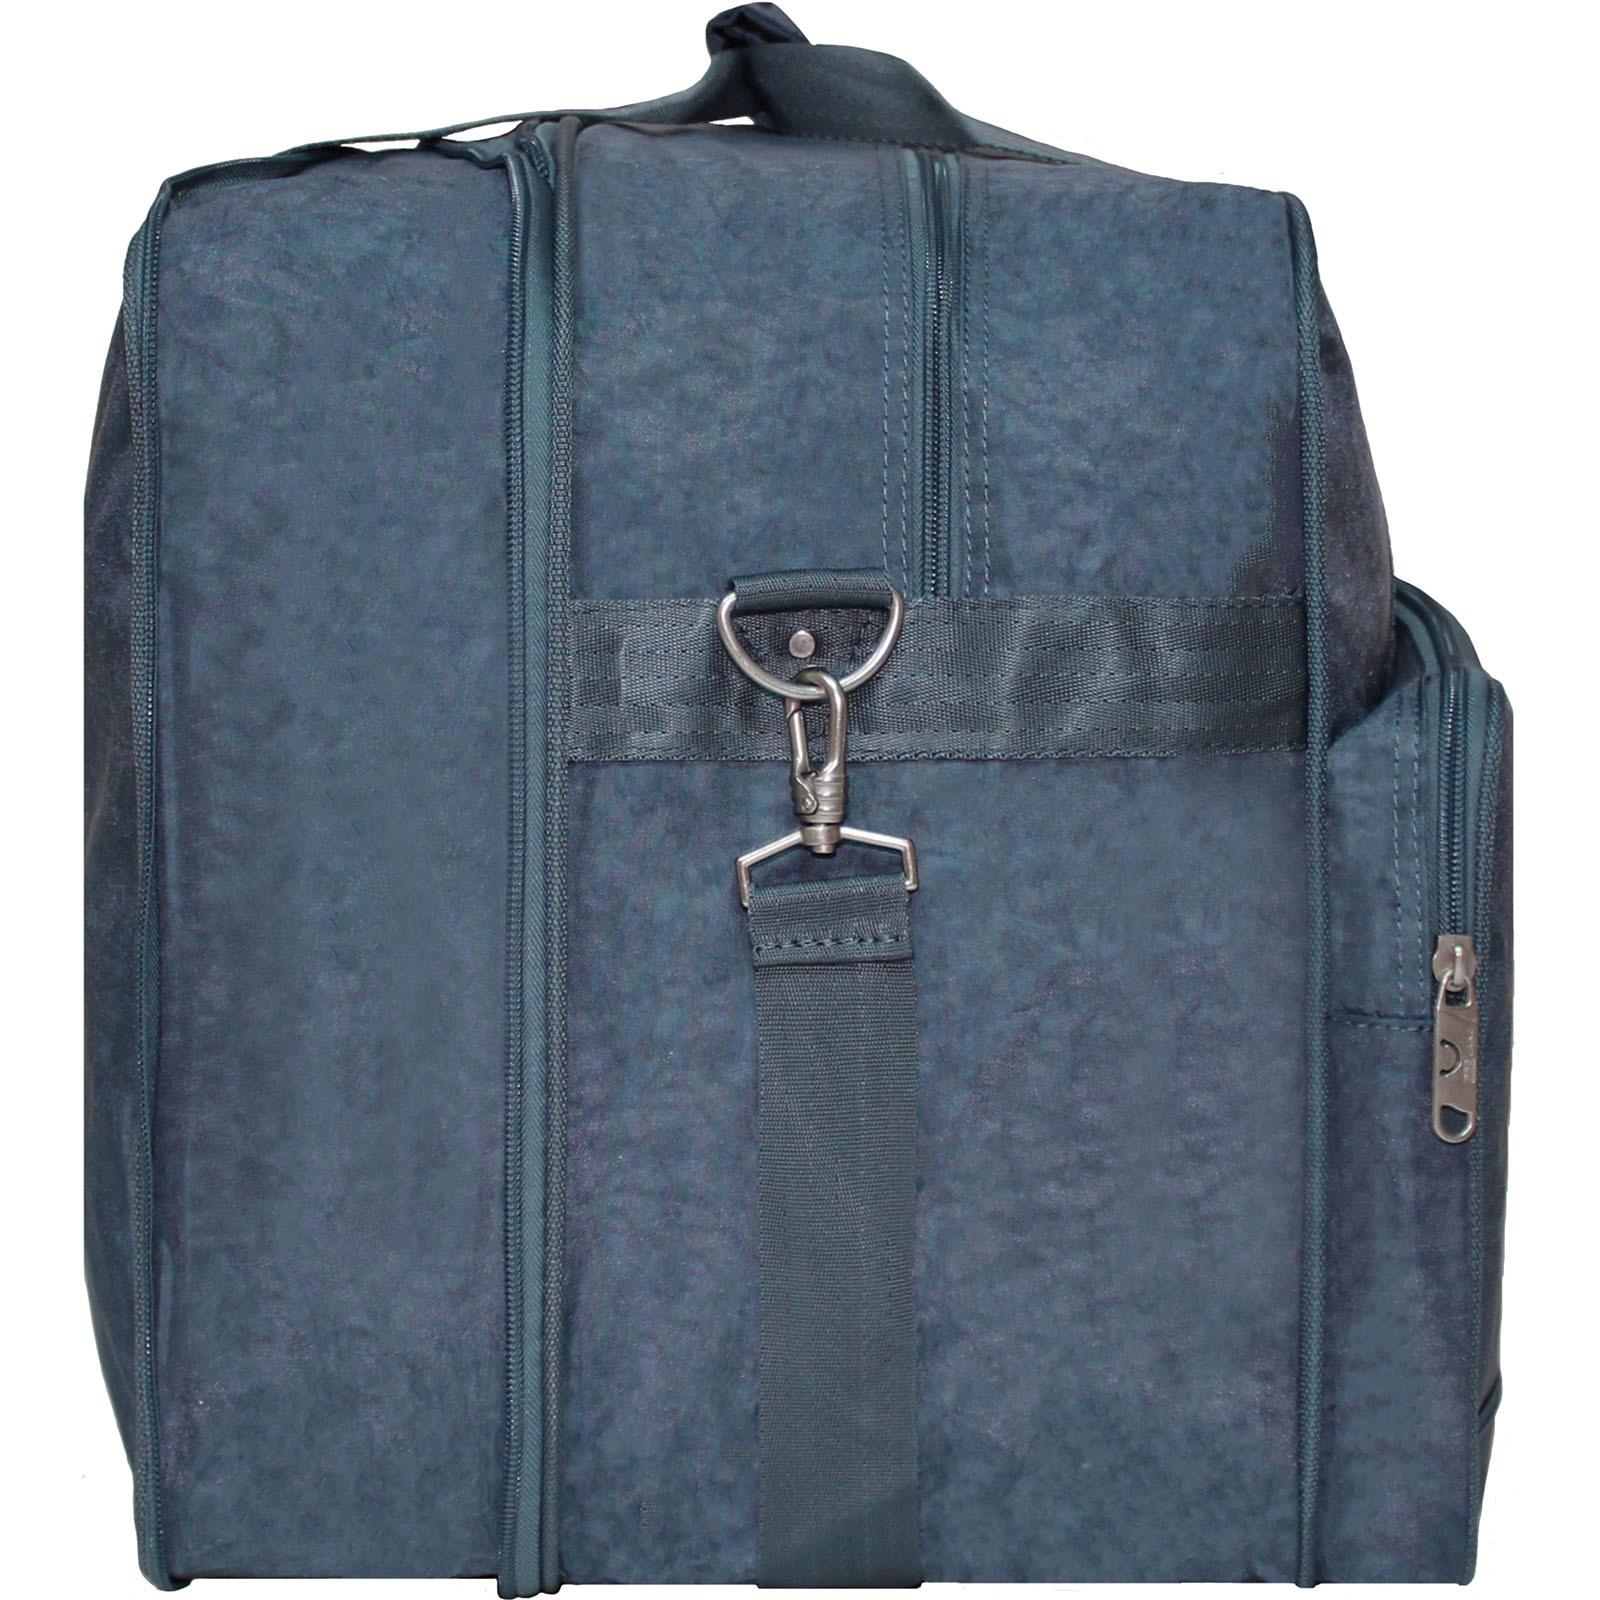 Дорожная сумка Bagland Рига 36 л. 321 серый (0030370)